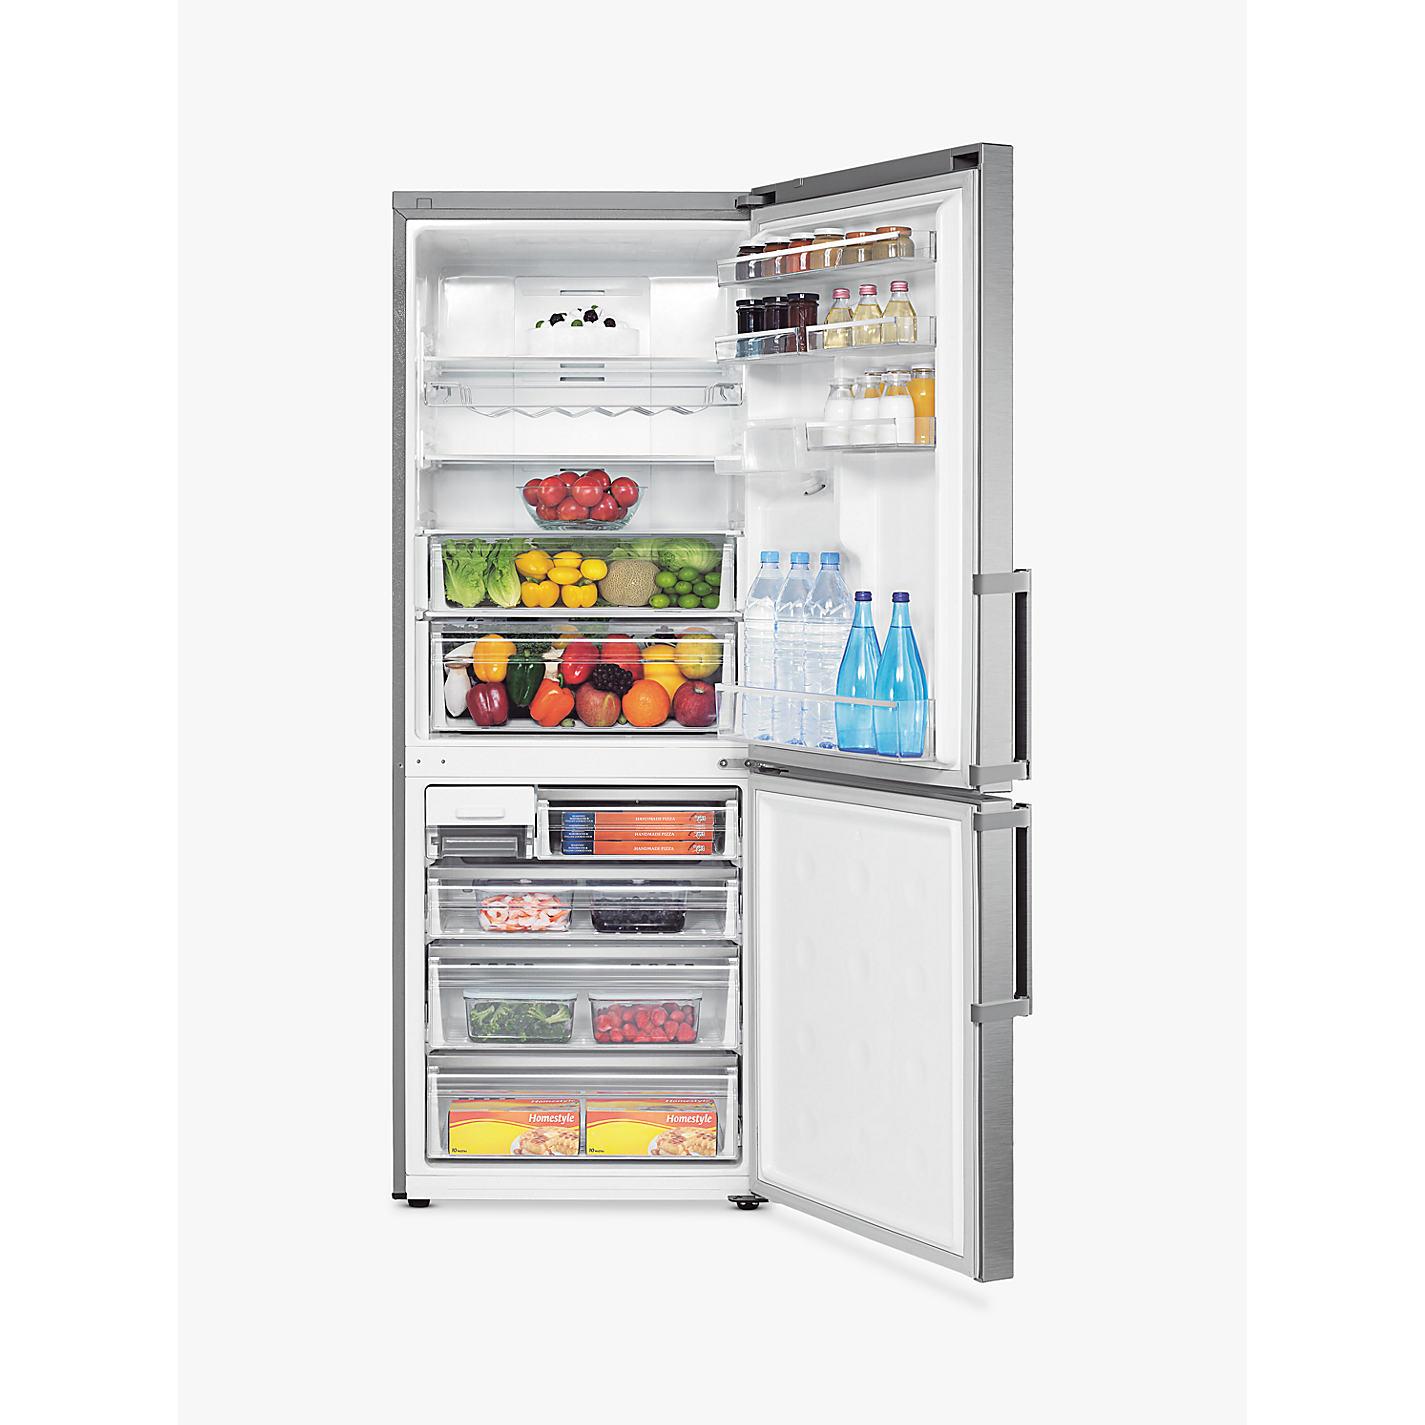 samsung fridge freezer. buy samsung rl4362fbasl fridge freezer, a+ energy rating, 70cm wide, stainless steel online freezer